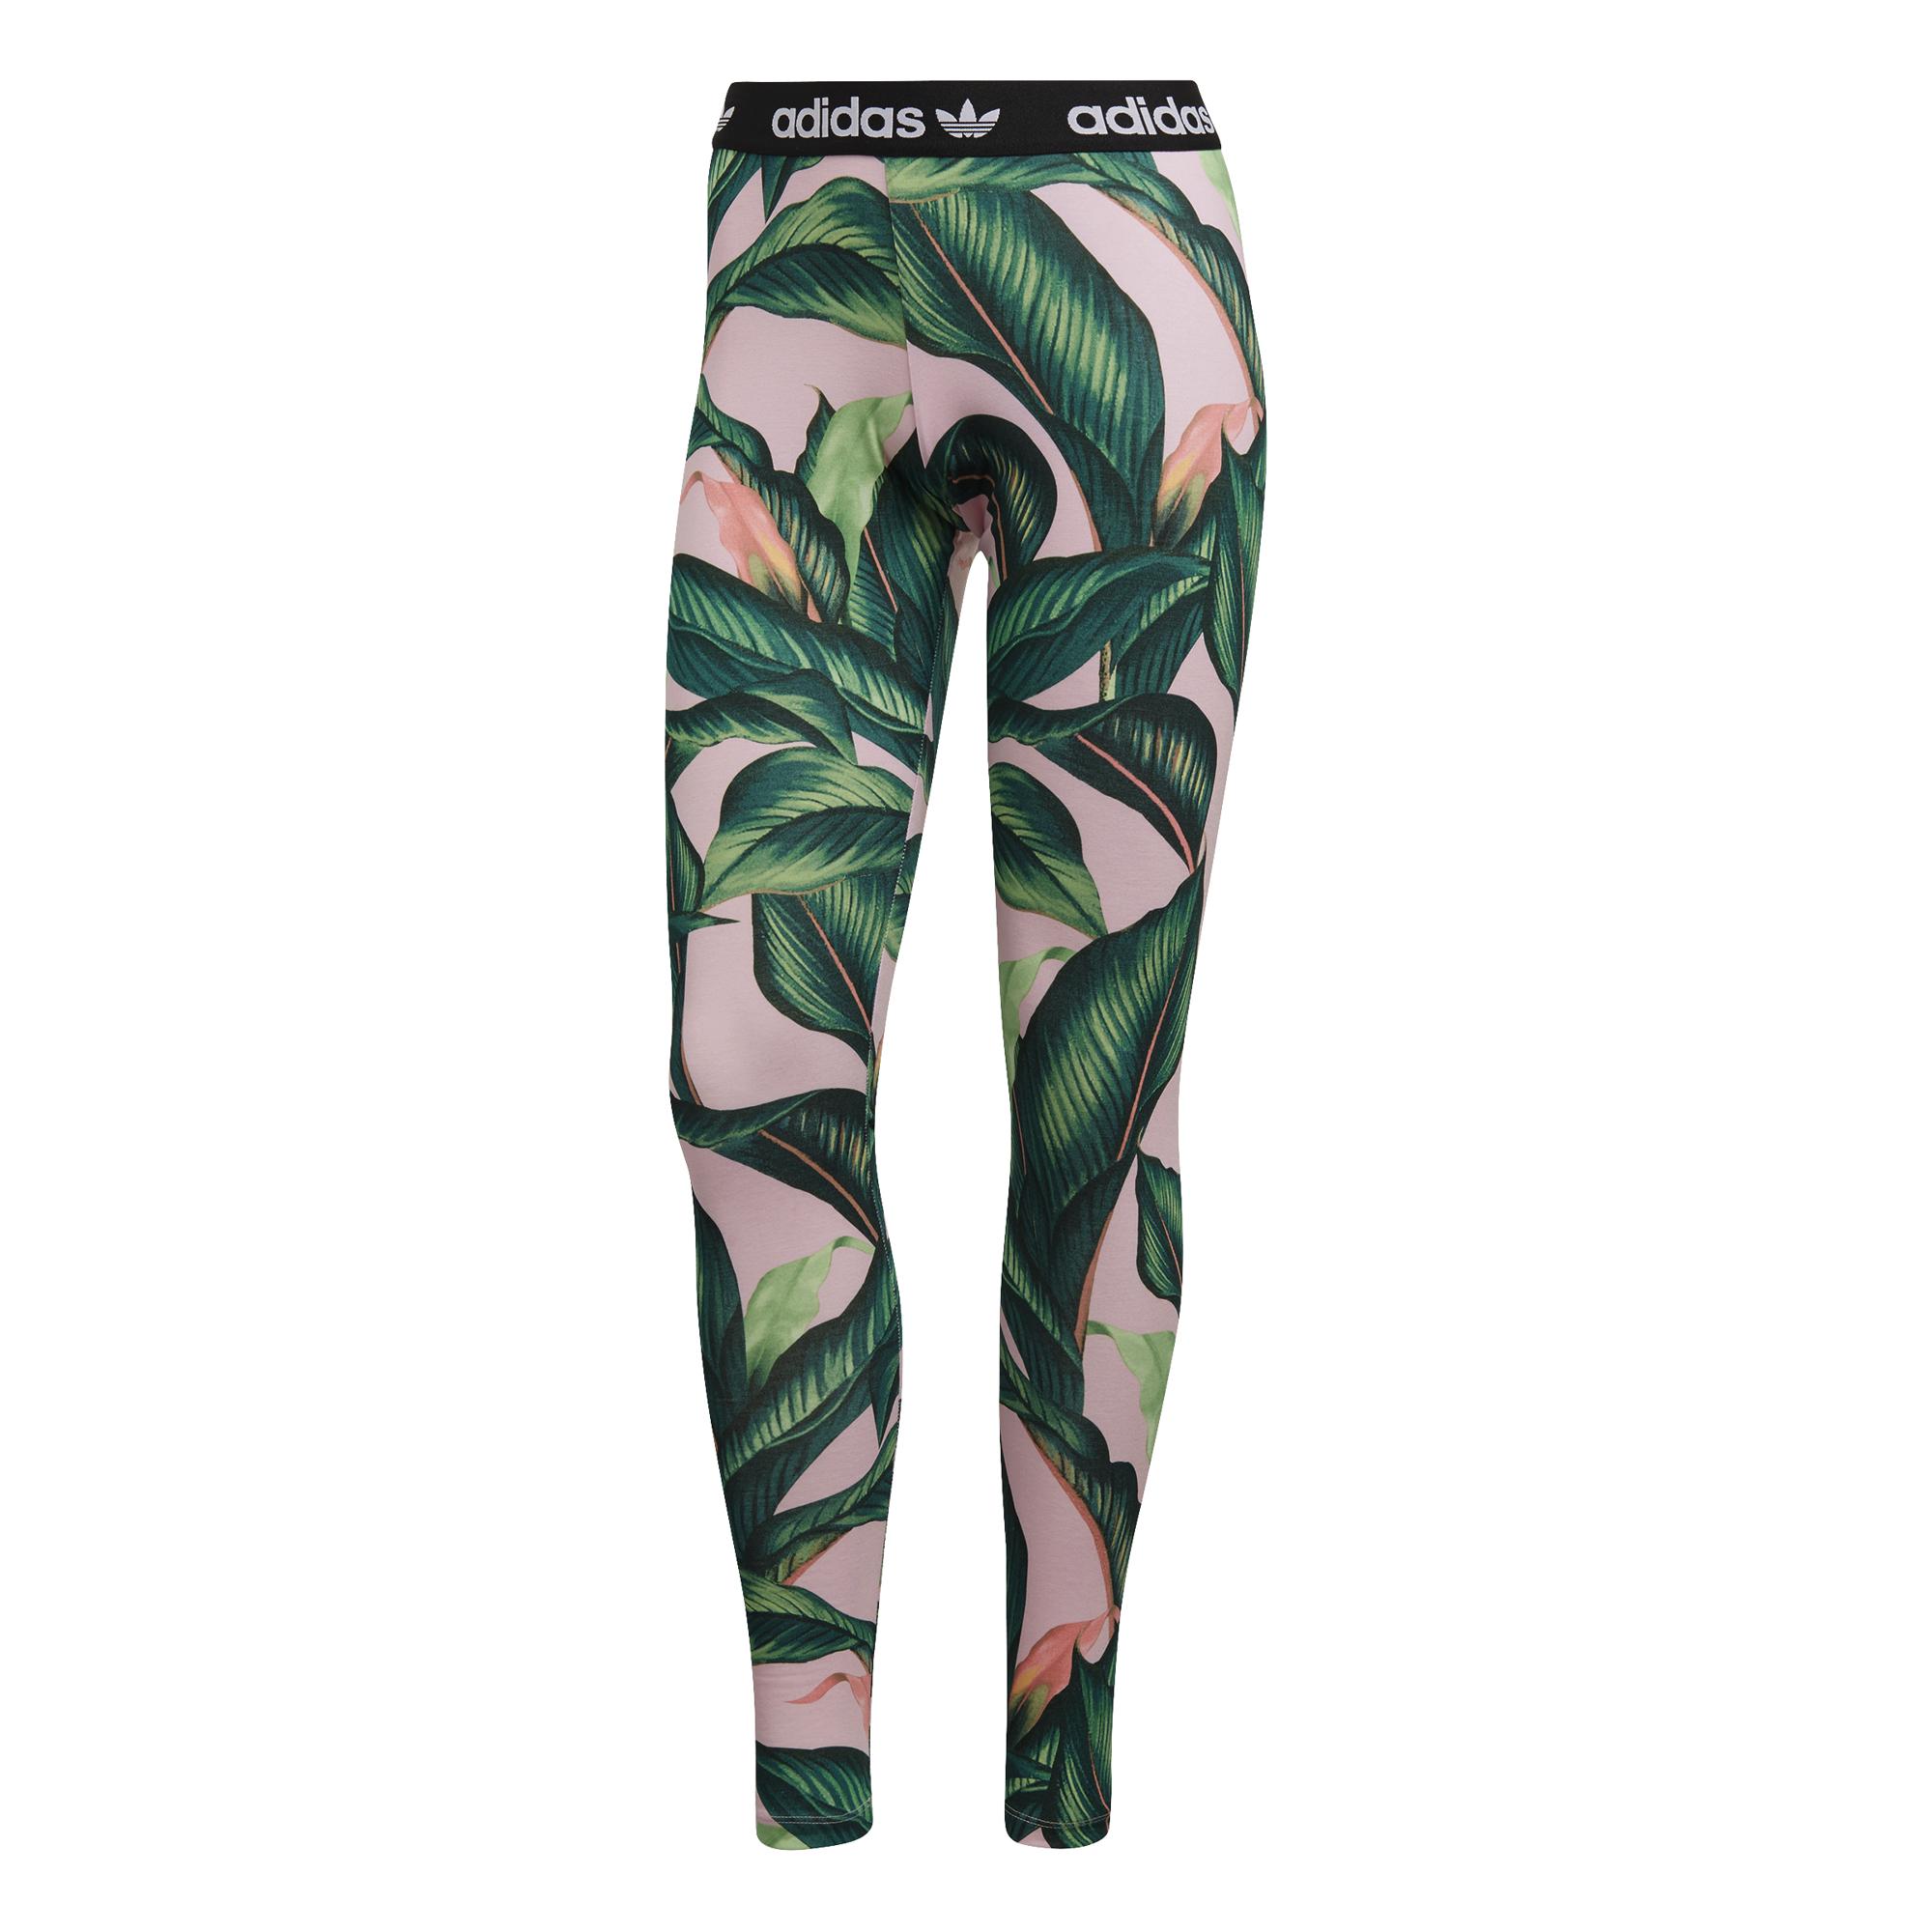 pantalon legging adidas femme